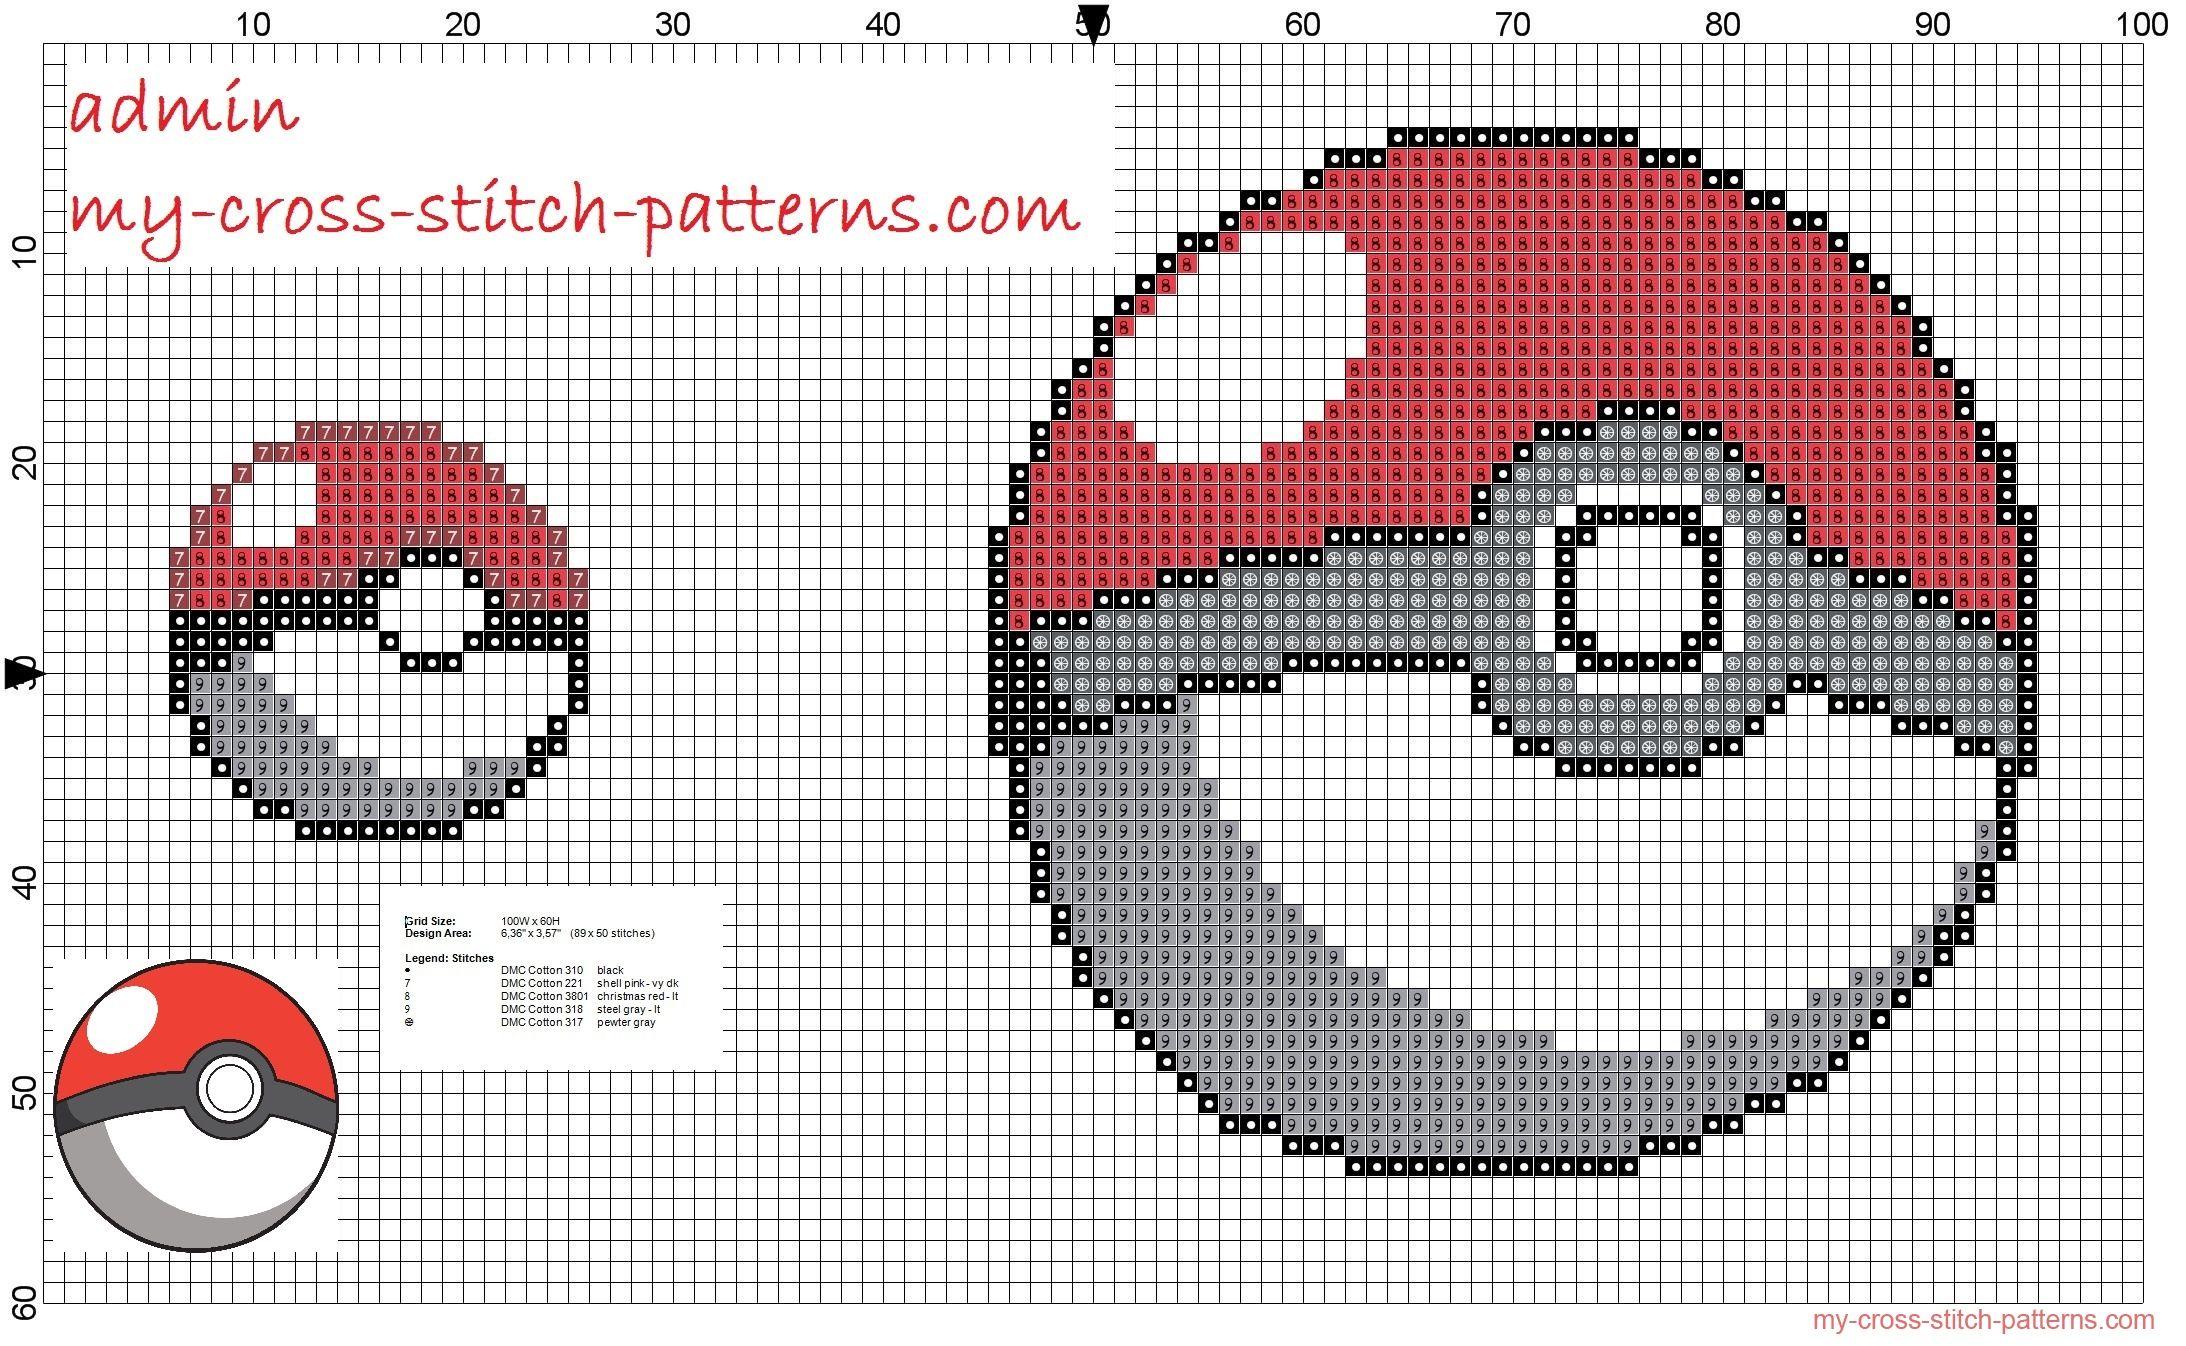 Pokéball 20x20 and 50x50 free cross stitch pattern - 2186x1346 ...